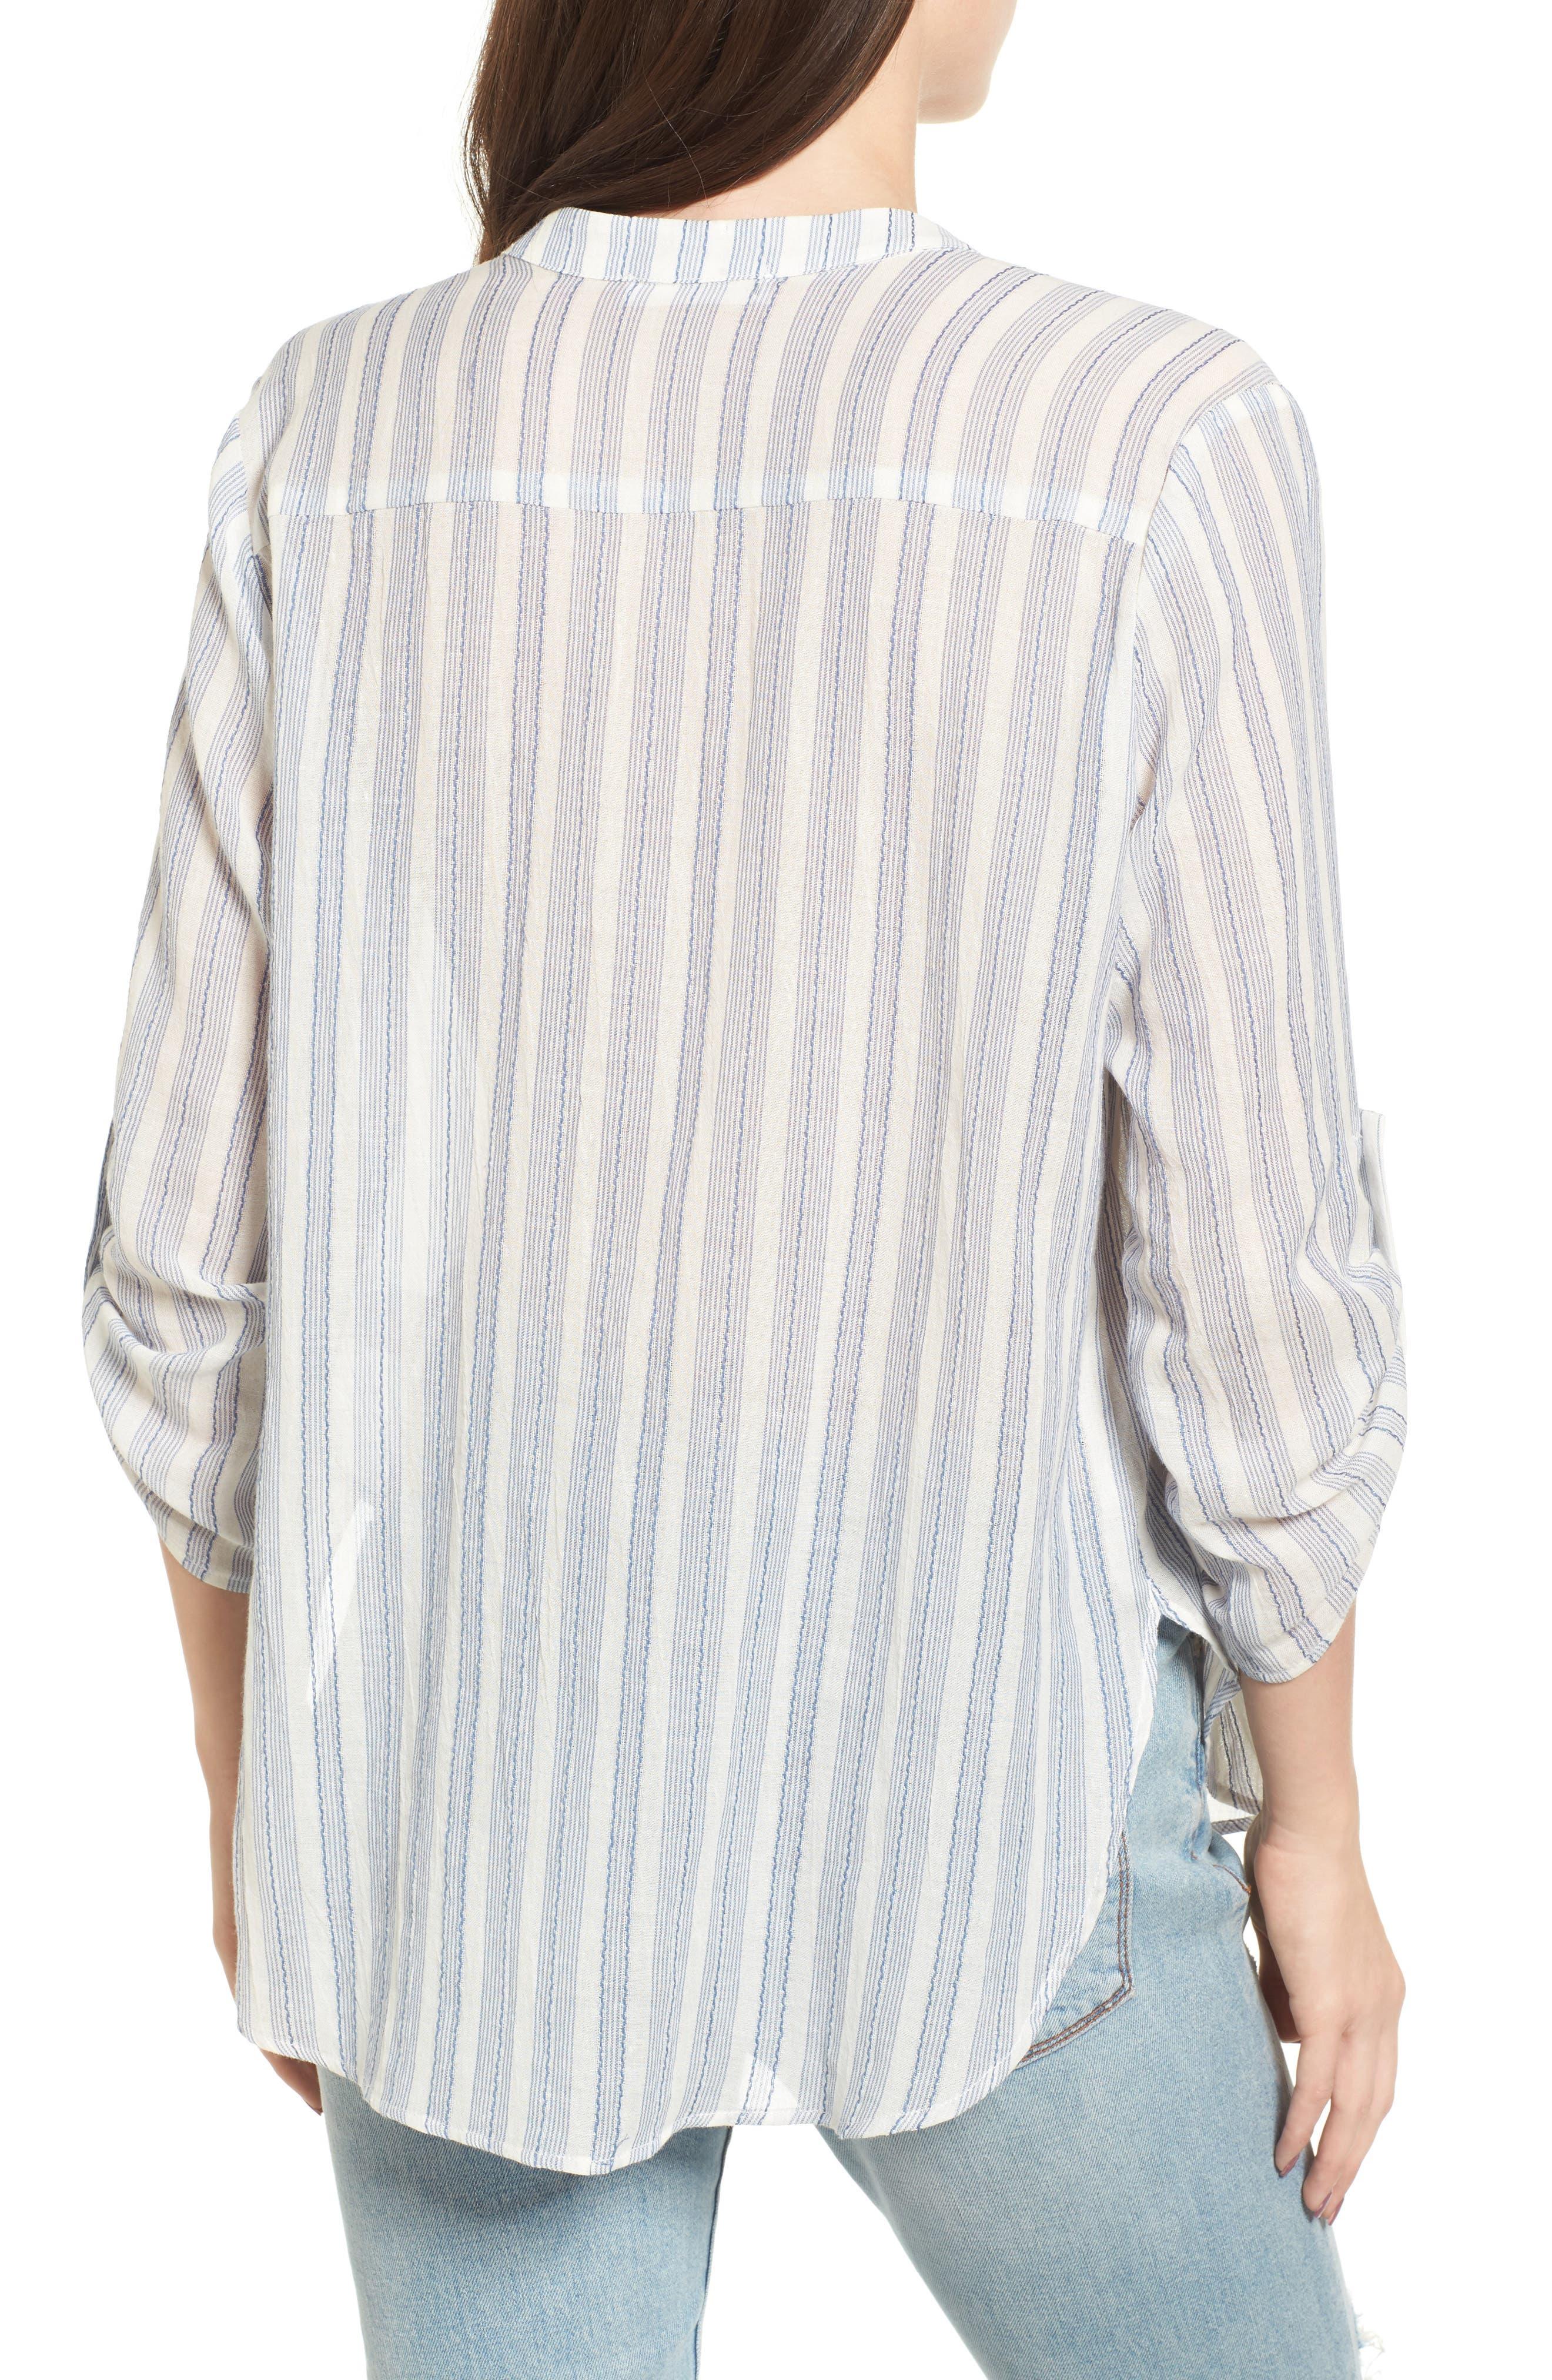 Stripe Cotton Split Neck Top,                             Alternate thumbnail 2, color,                             Blue/ White Stripe